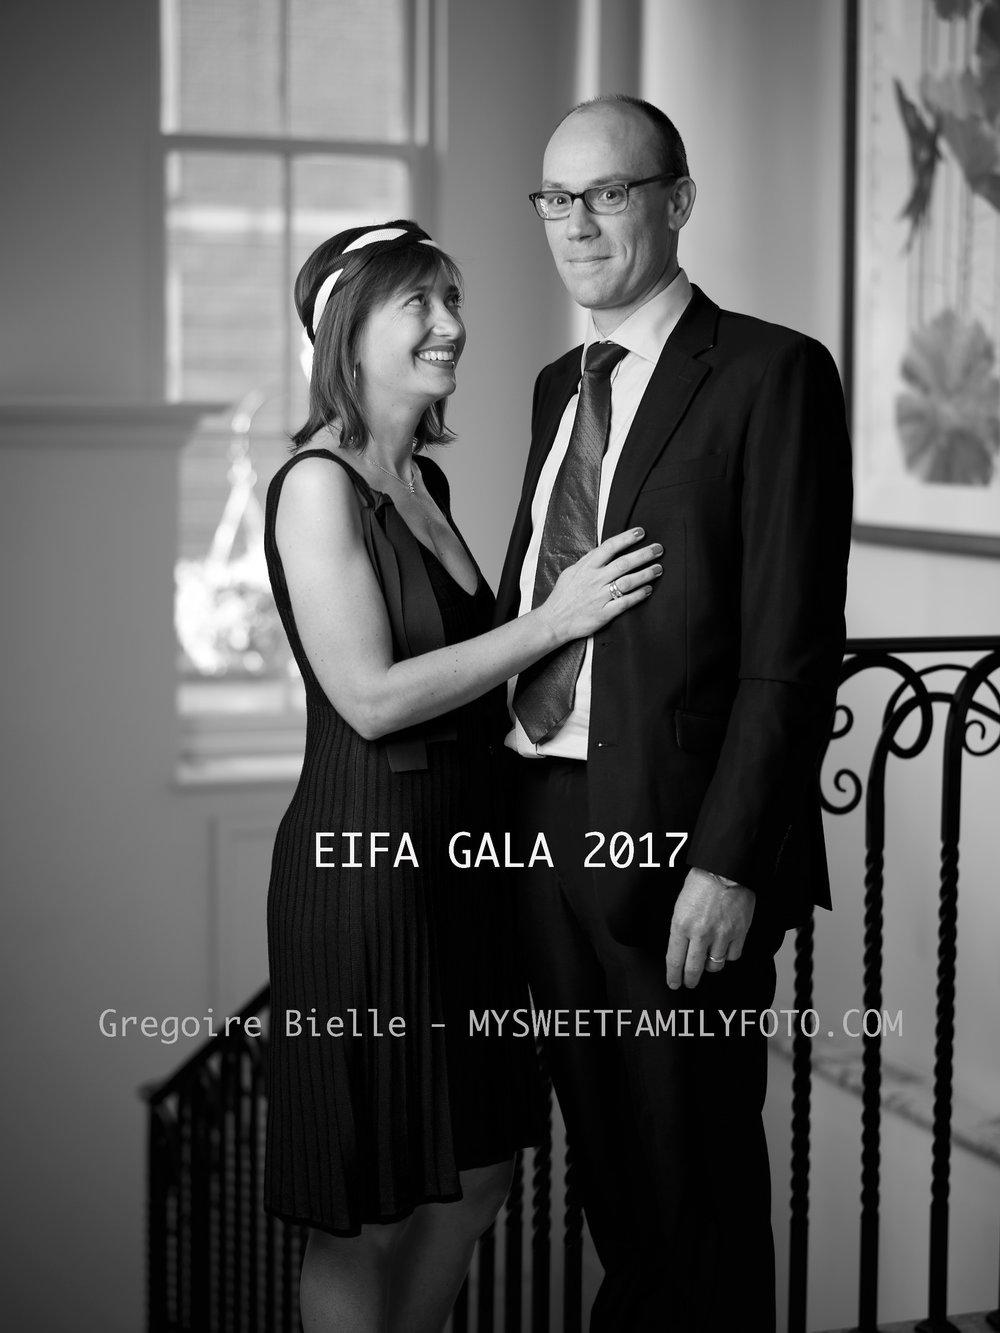 EIFA GALA 1029.jpg